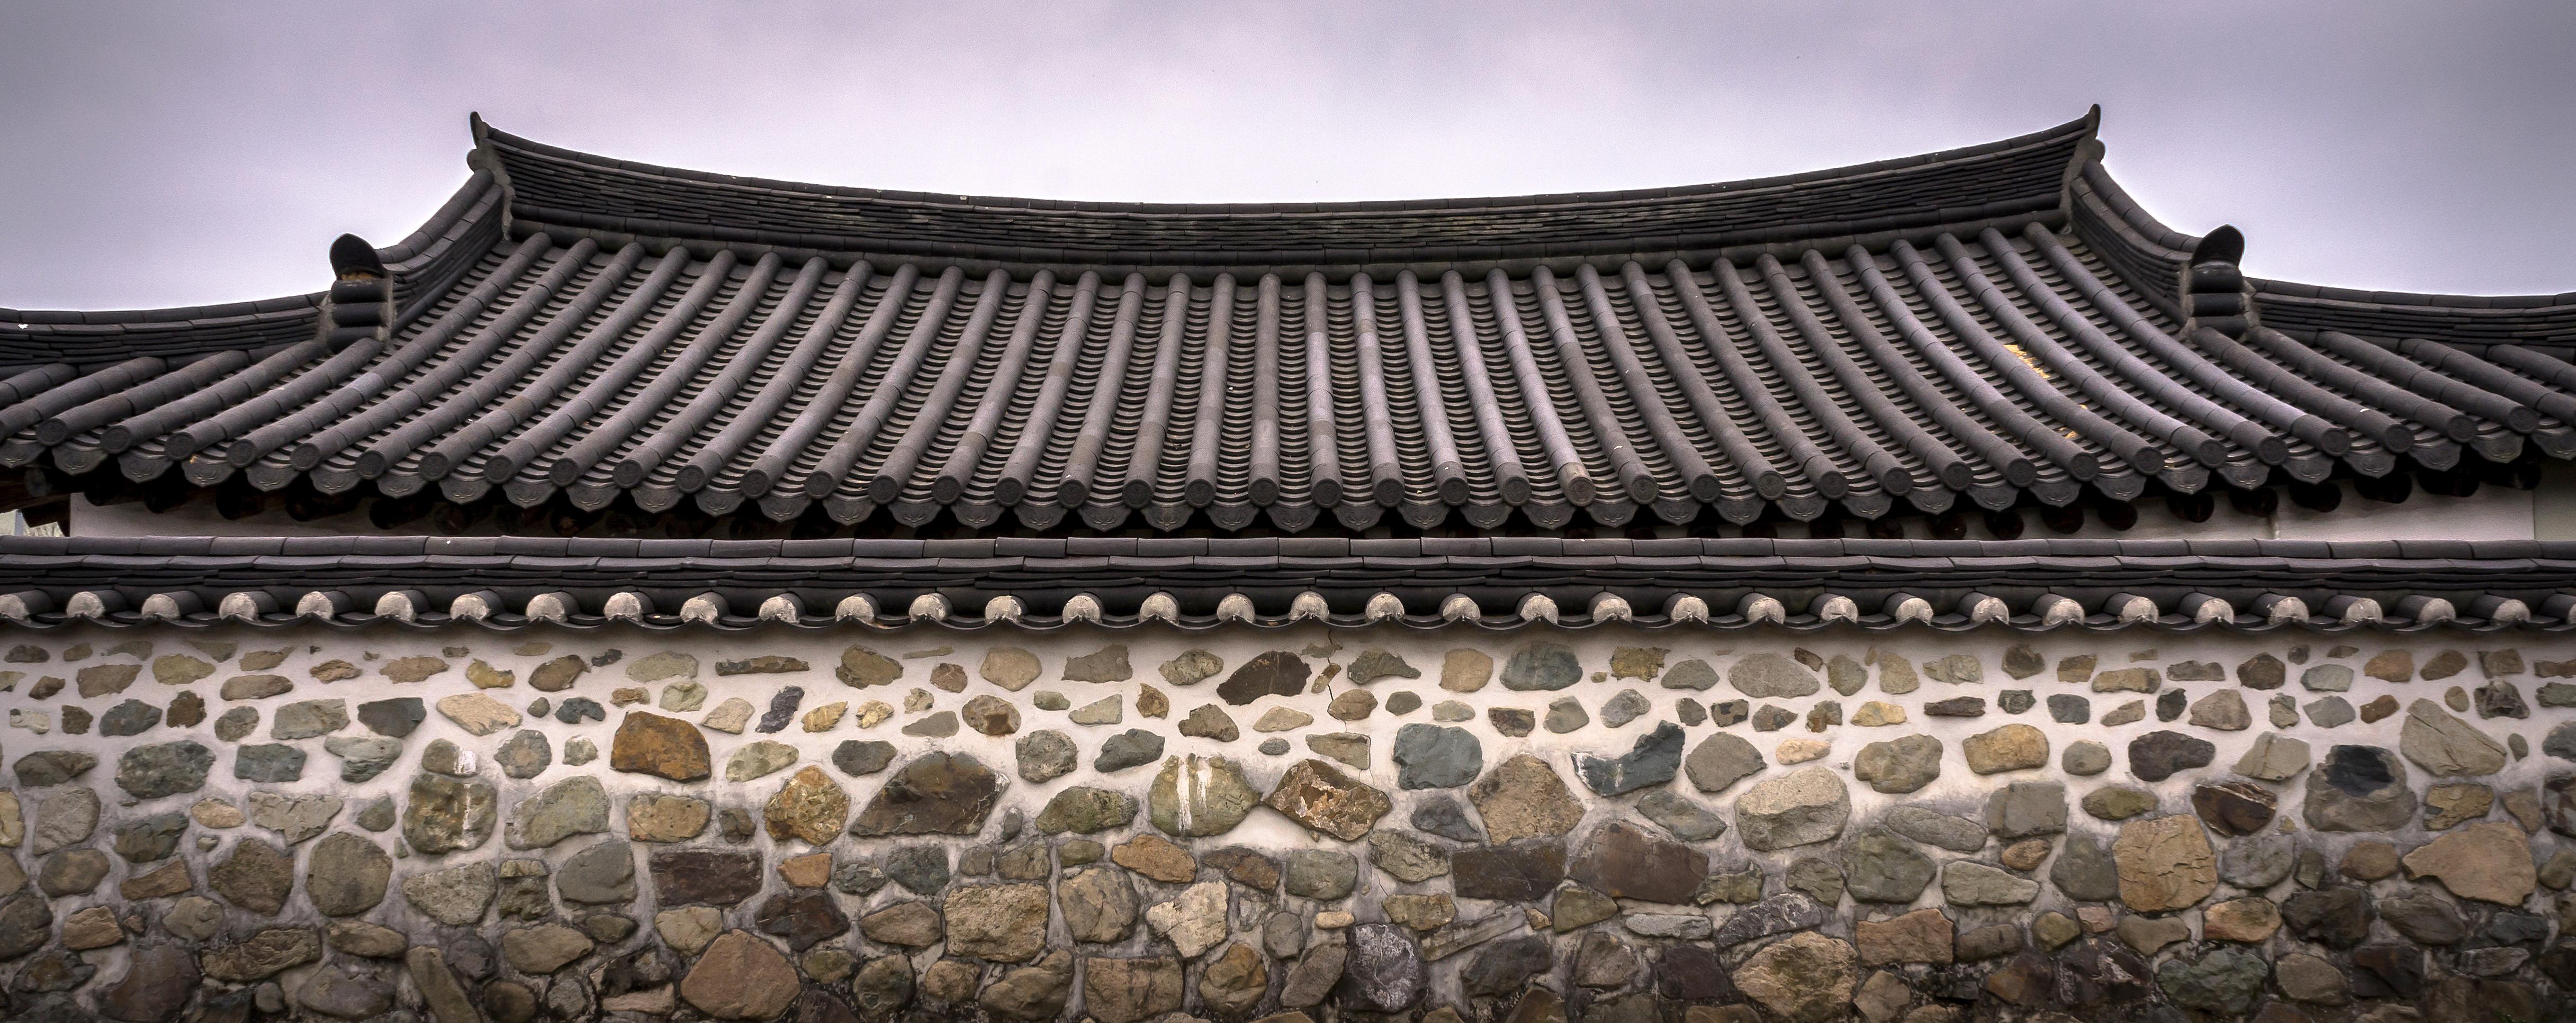 roof-tile-2159267